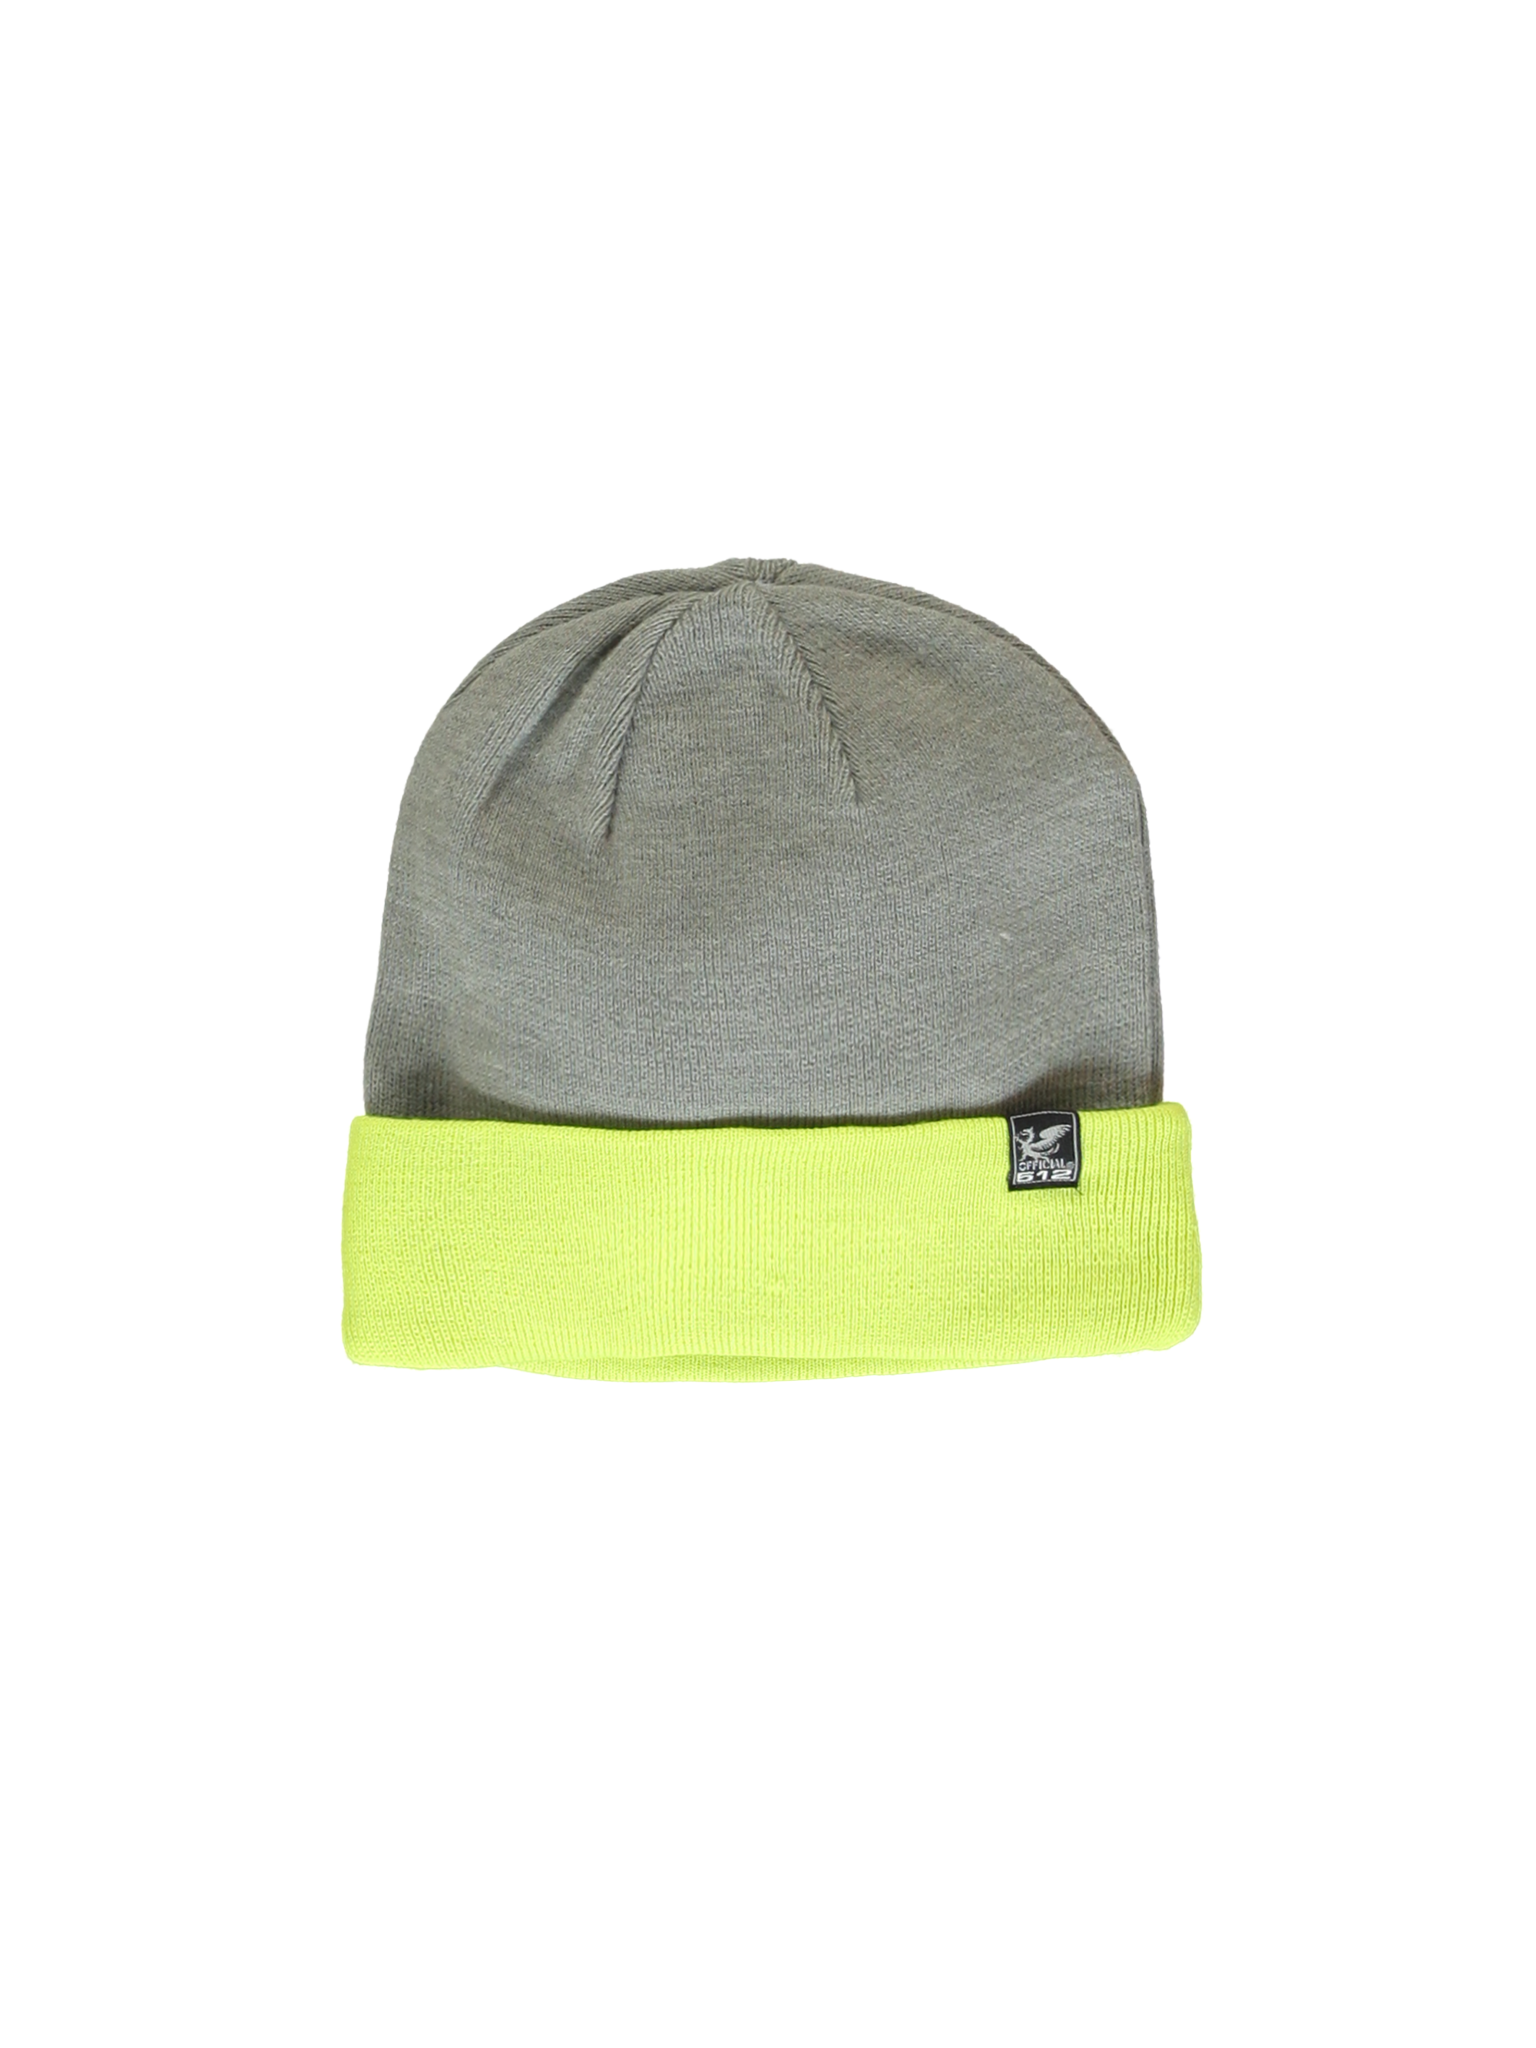 All Brands | Winterproducts Teen Boys | Bonnet | 24 pcs/box